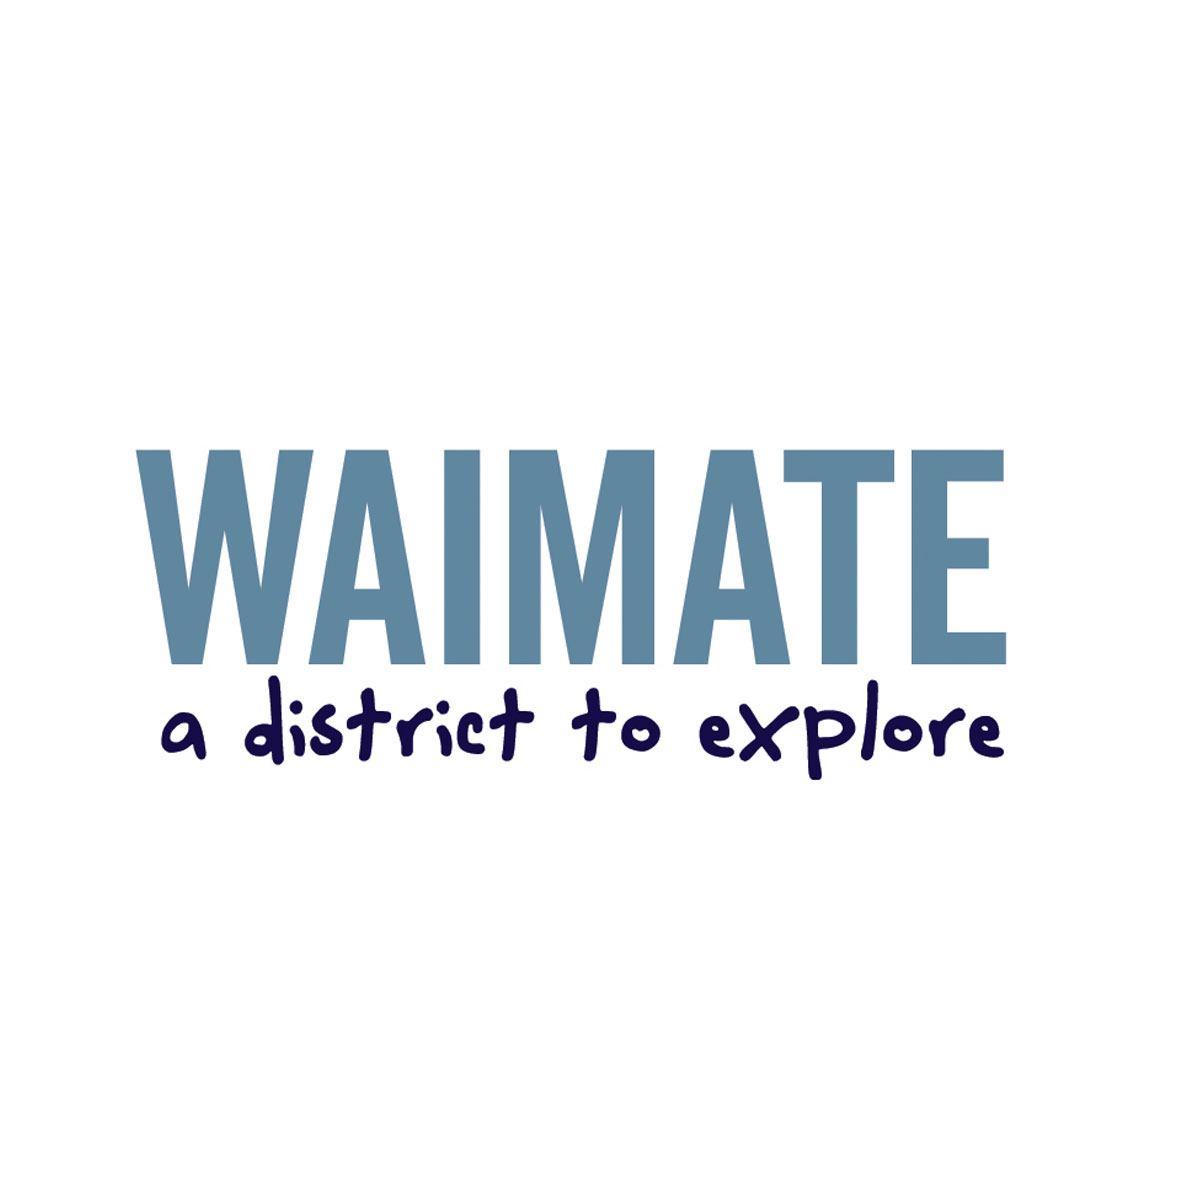 waimate.jpg